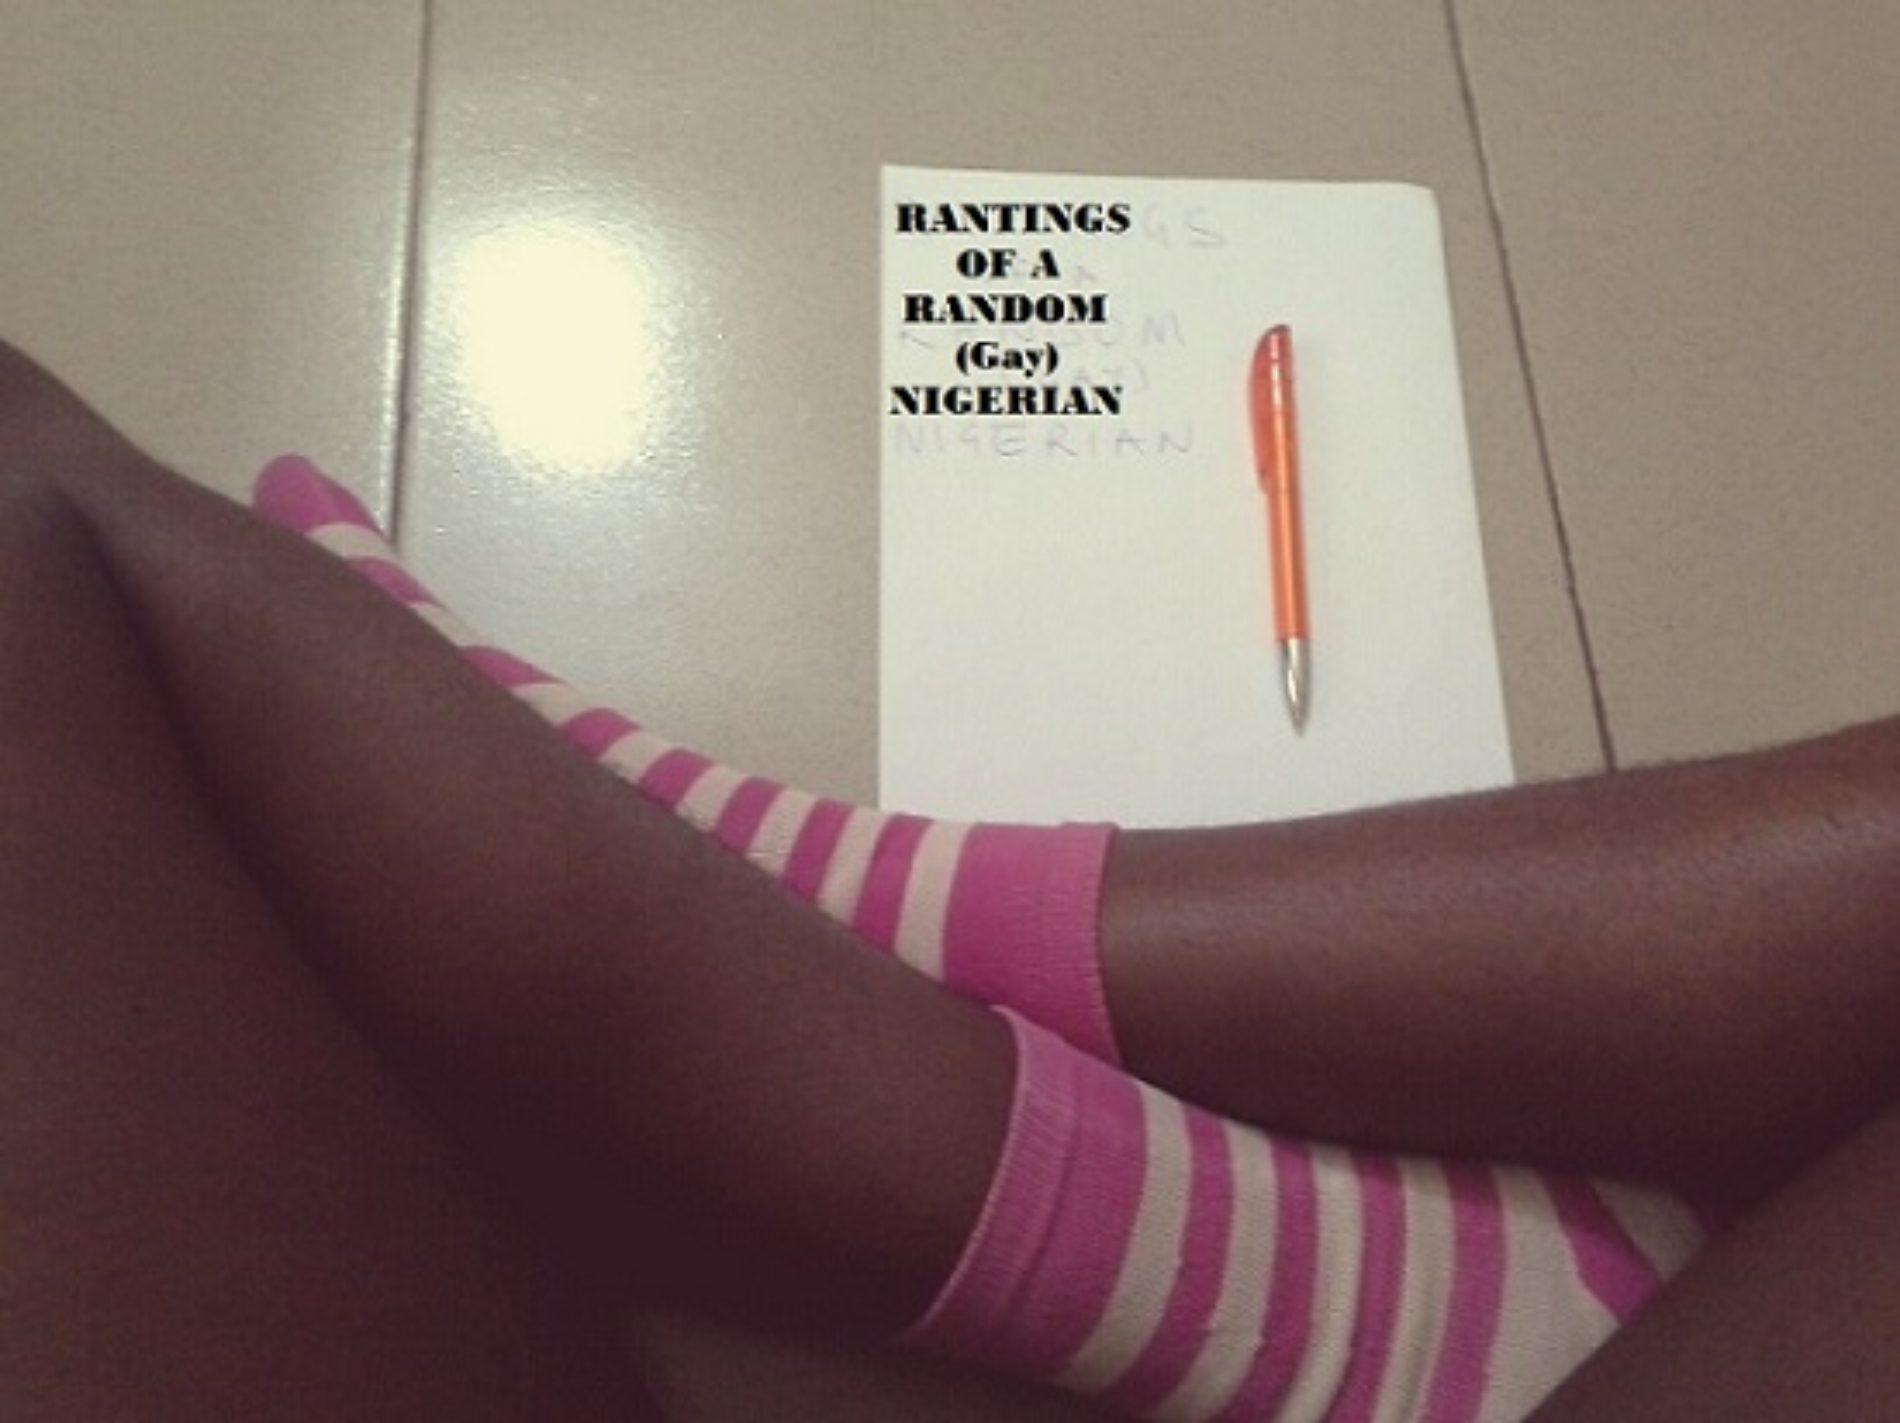 RANTINGS OF A RANDOM (Gay) NIGERIAN (Entry 3)